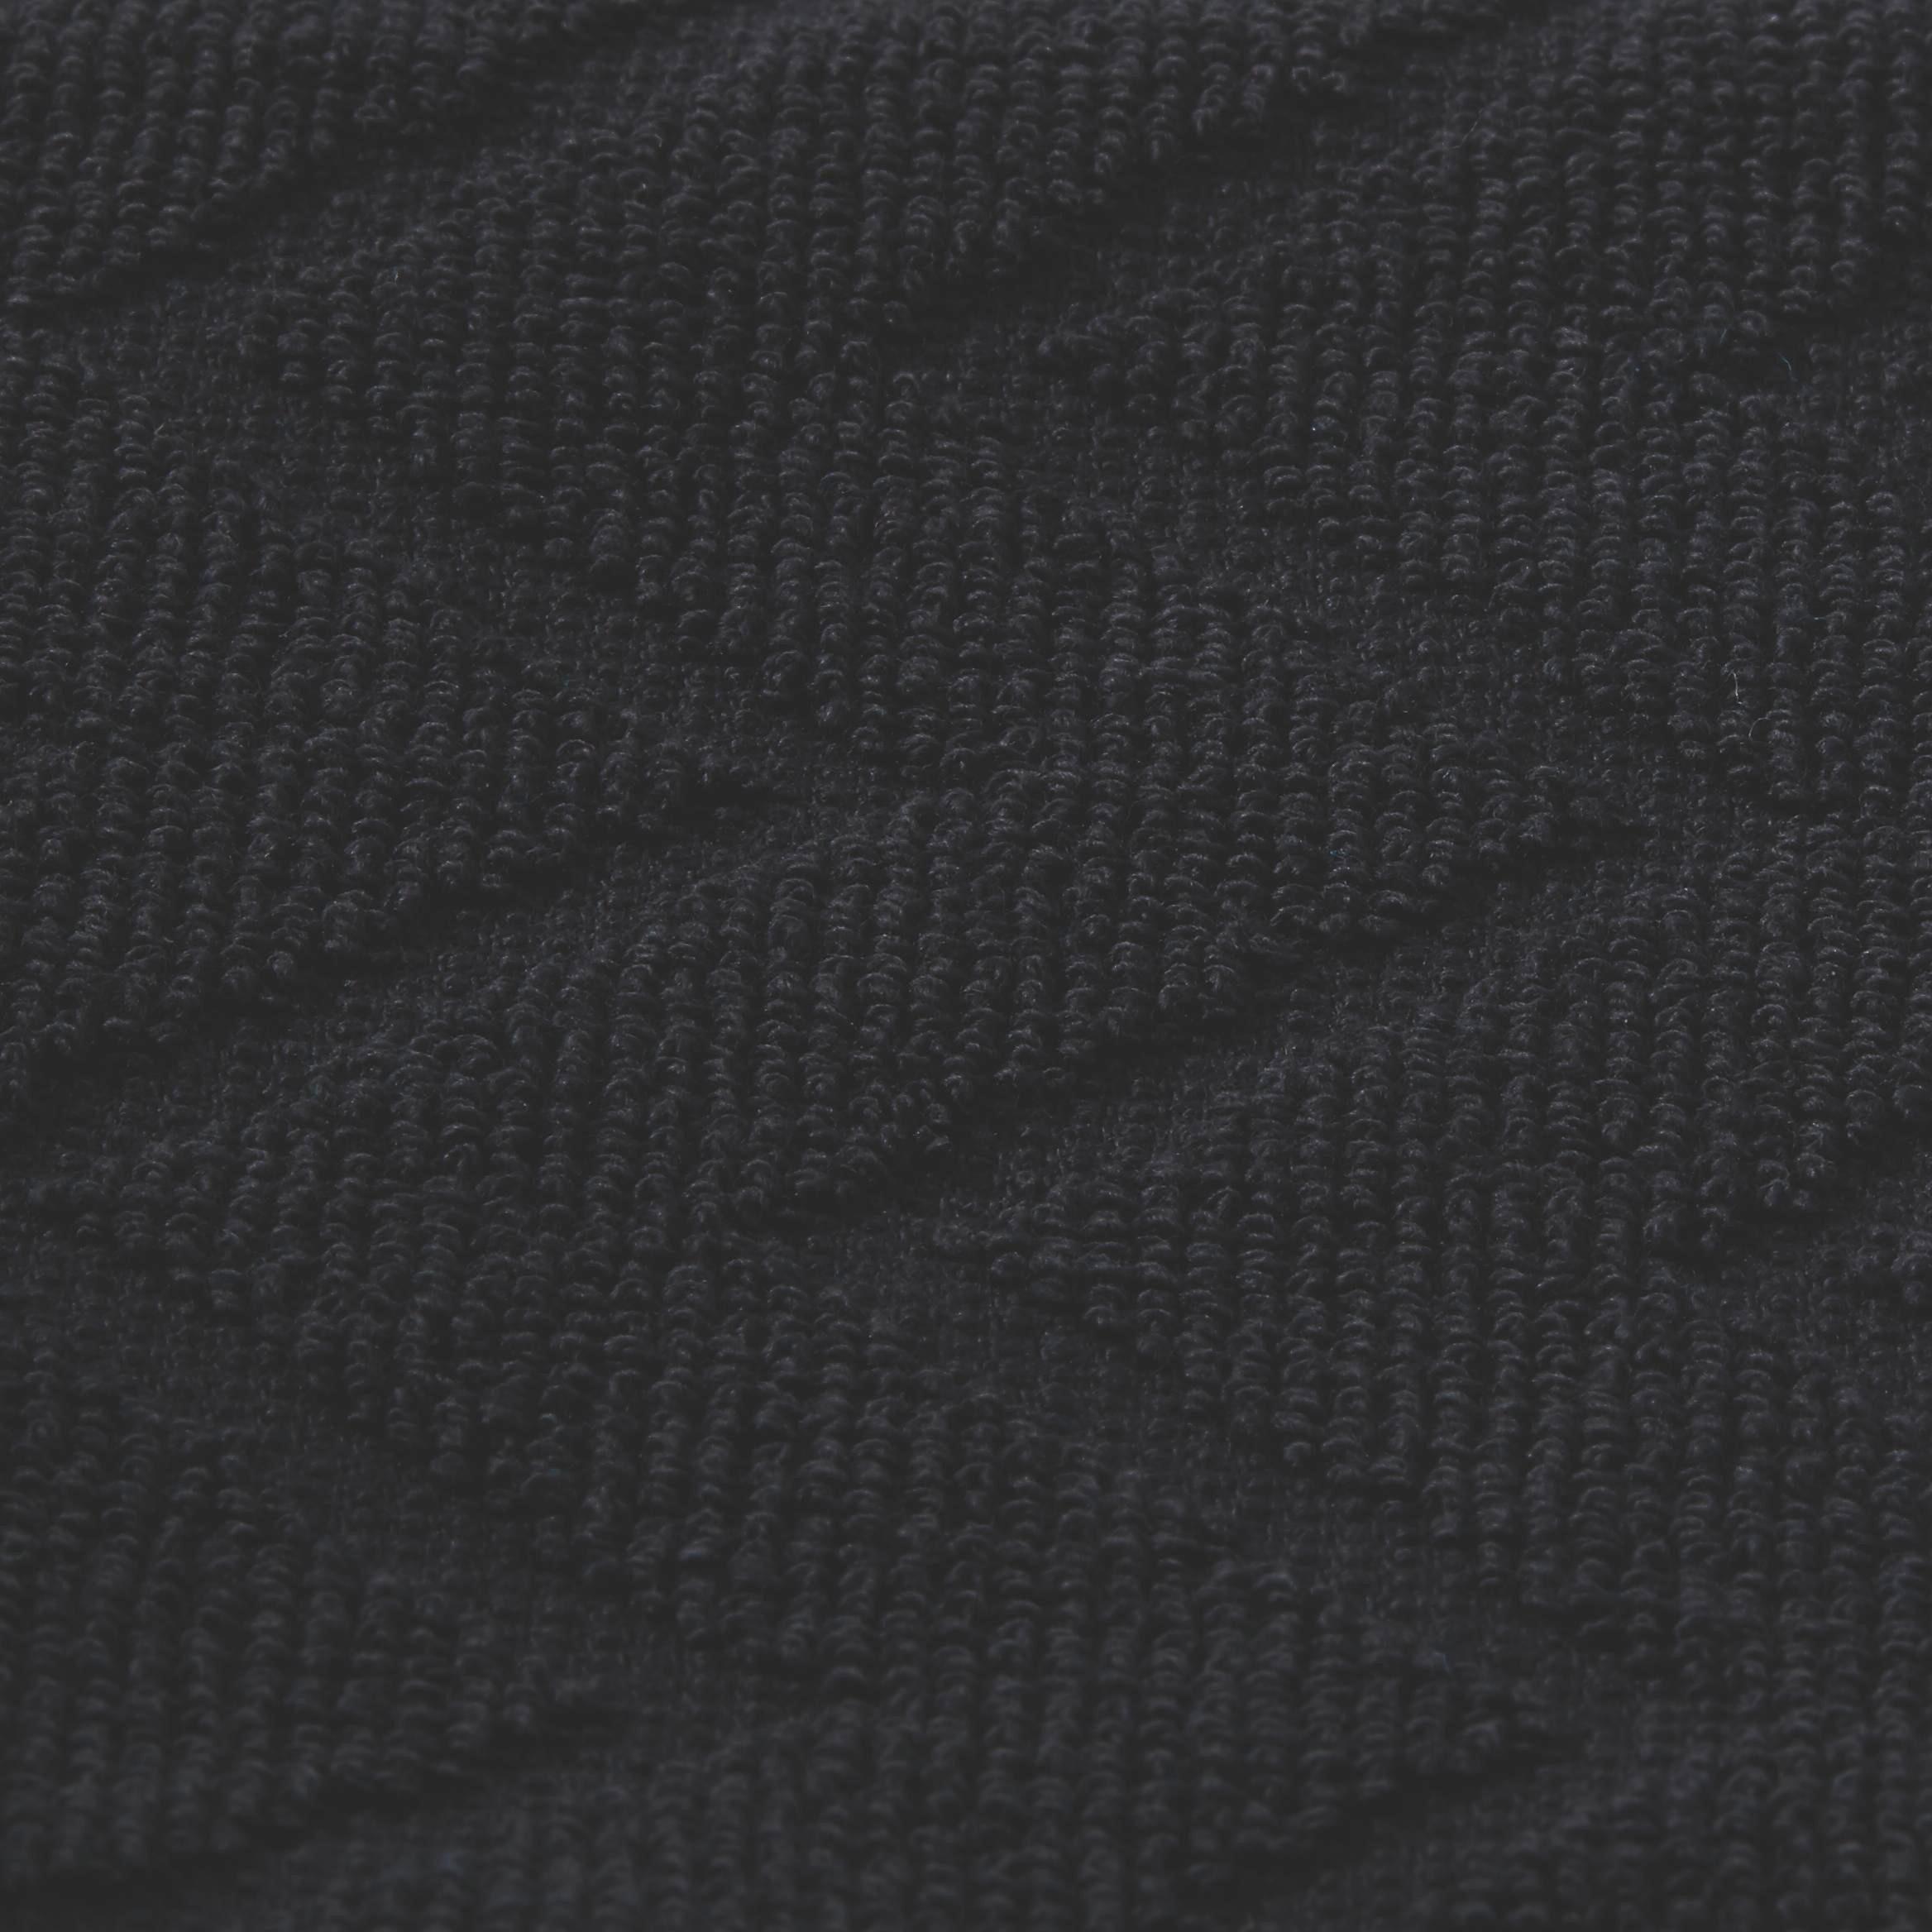 Fürdőlepedő Peter - fekete, textil (70/140cm) - MÖMAX modern living